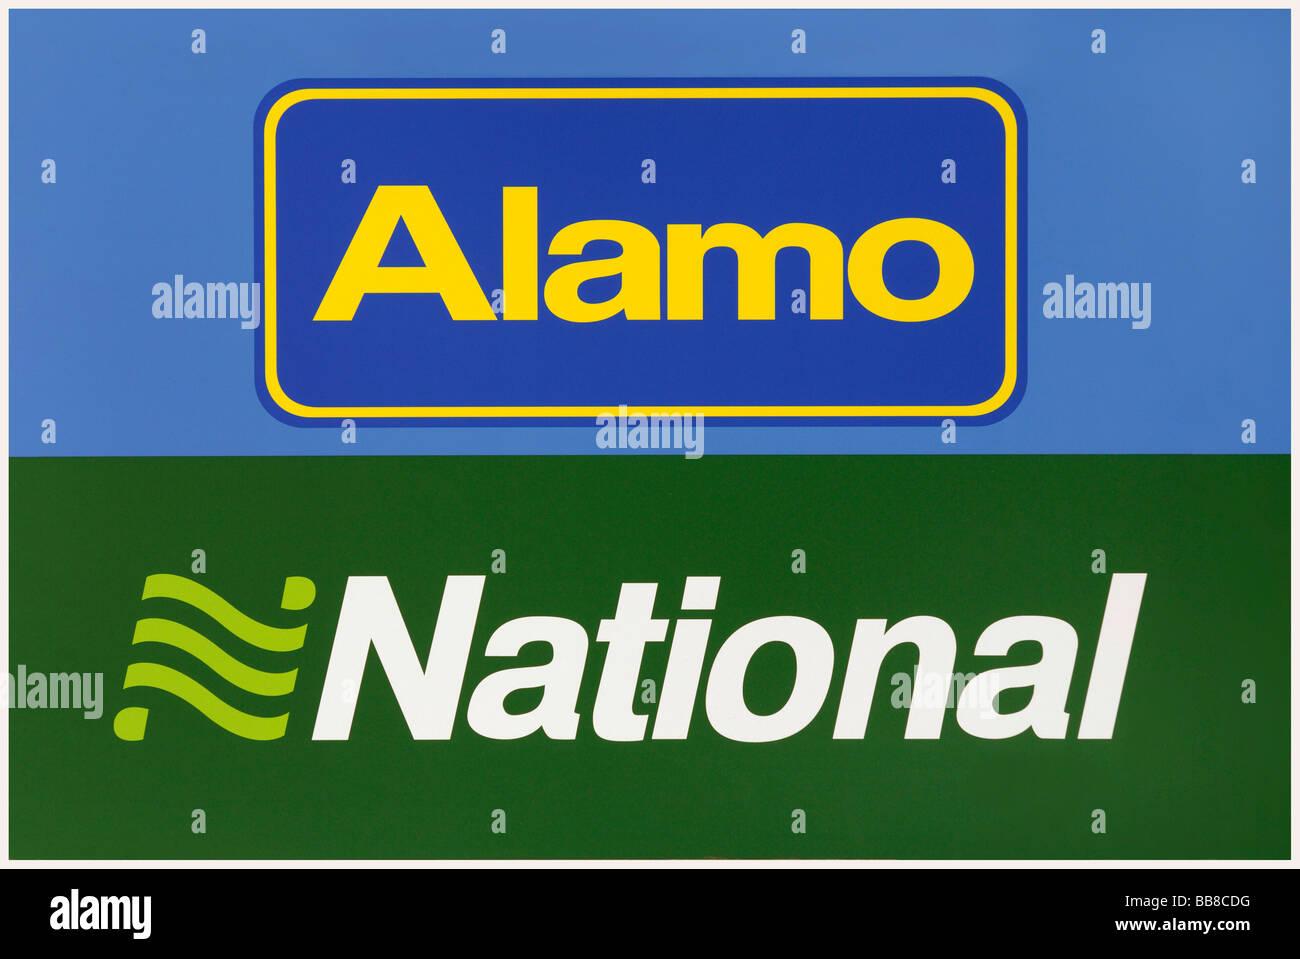 Alamo National Car Rental Service, alquiler de autos Imagen De Stock